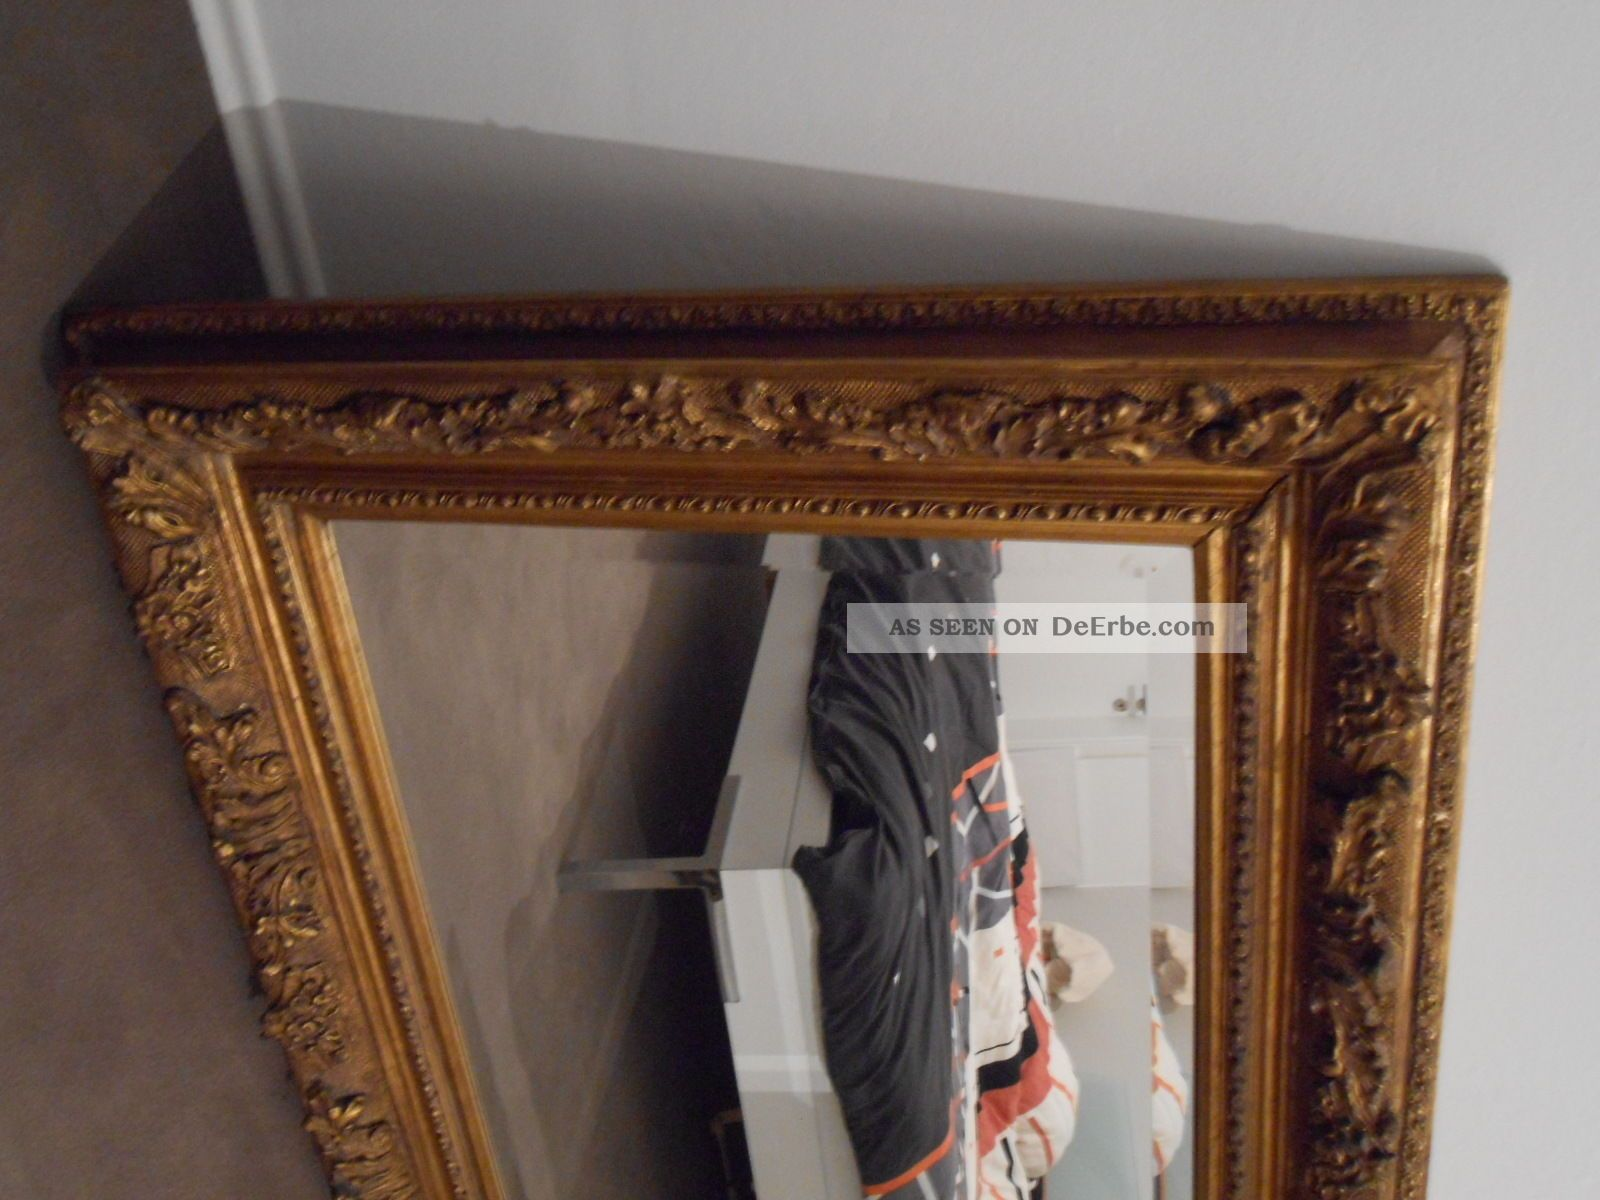 spiegel wandspiegel facettenschliff 2017 09 02 02 17 58. Black Bedroom Furniture Sets. Home Design Ideas